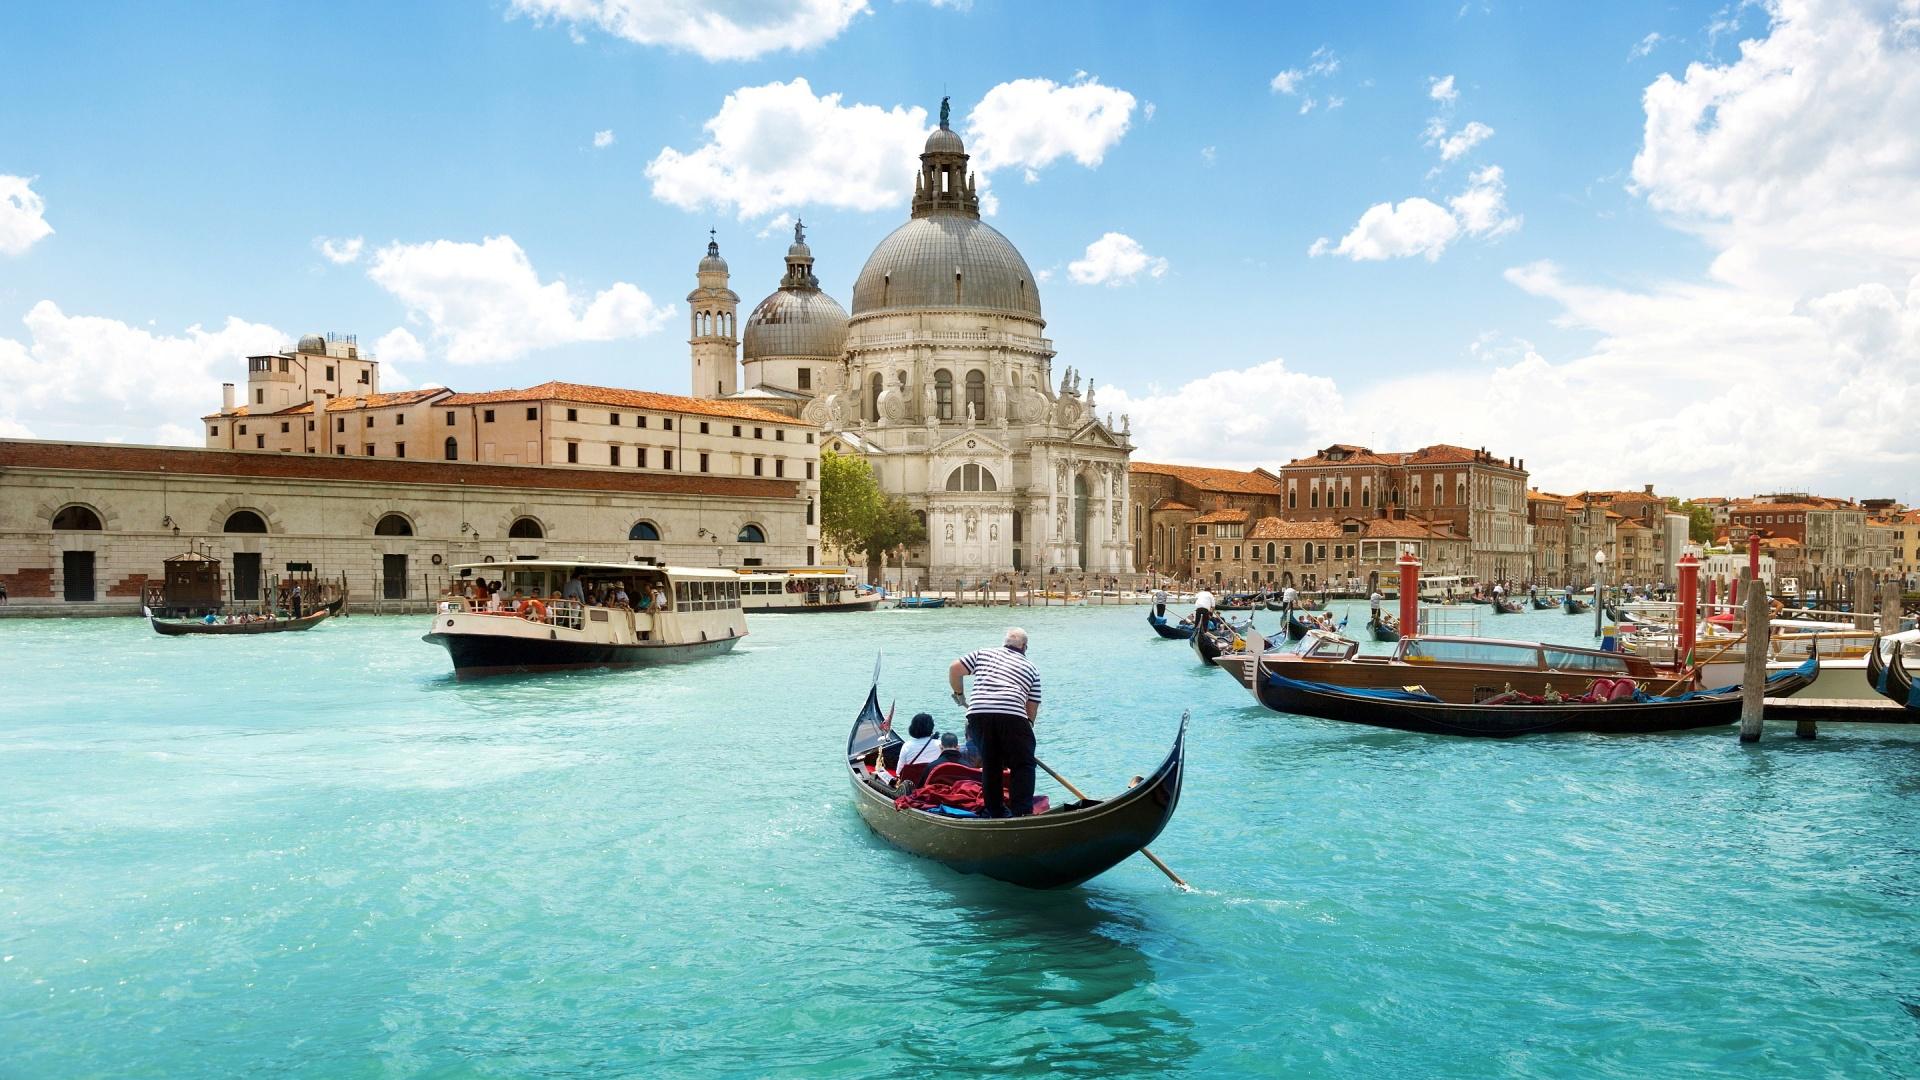 Venice Italy Pic